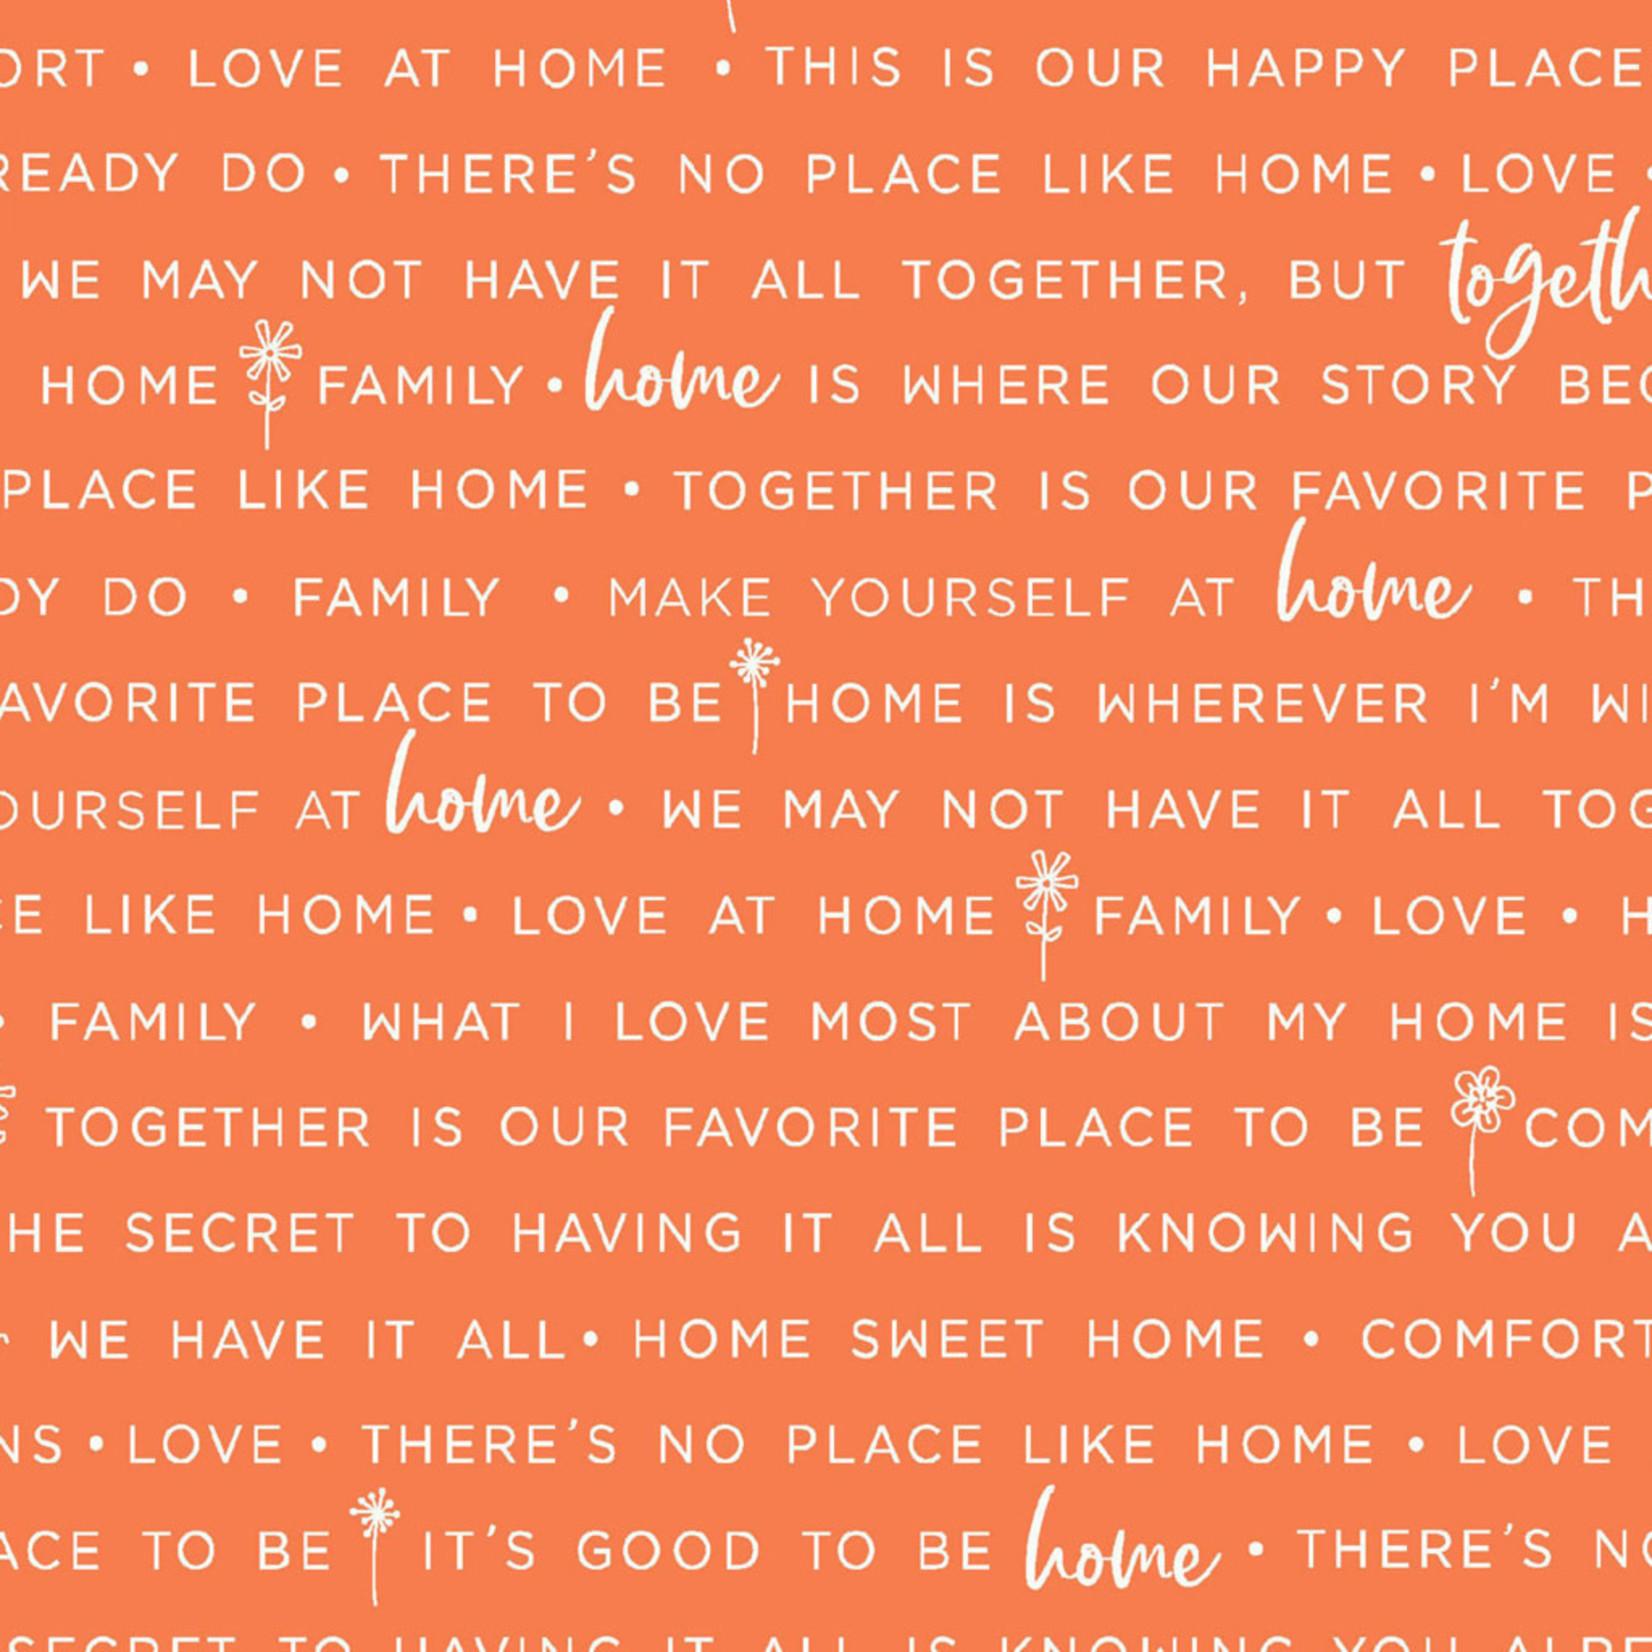 Maywood Studio Make Yourself at Home - Phrases - Orange